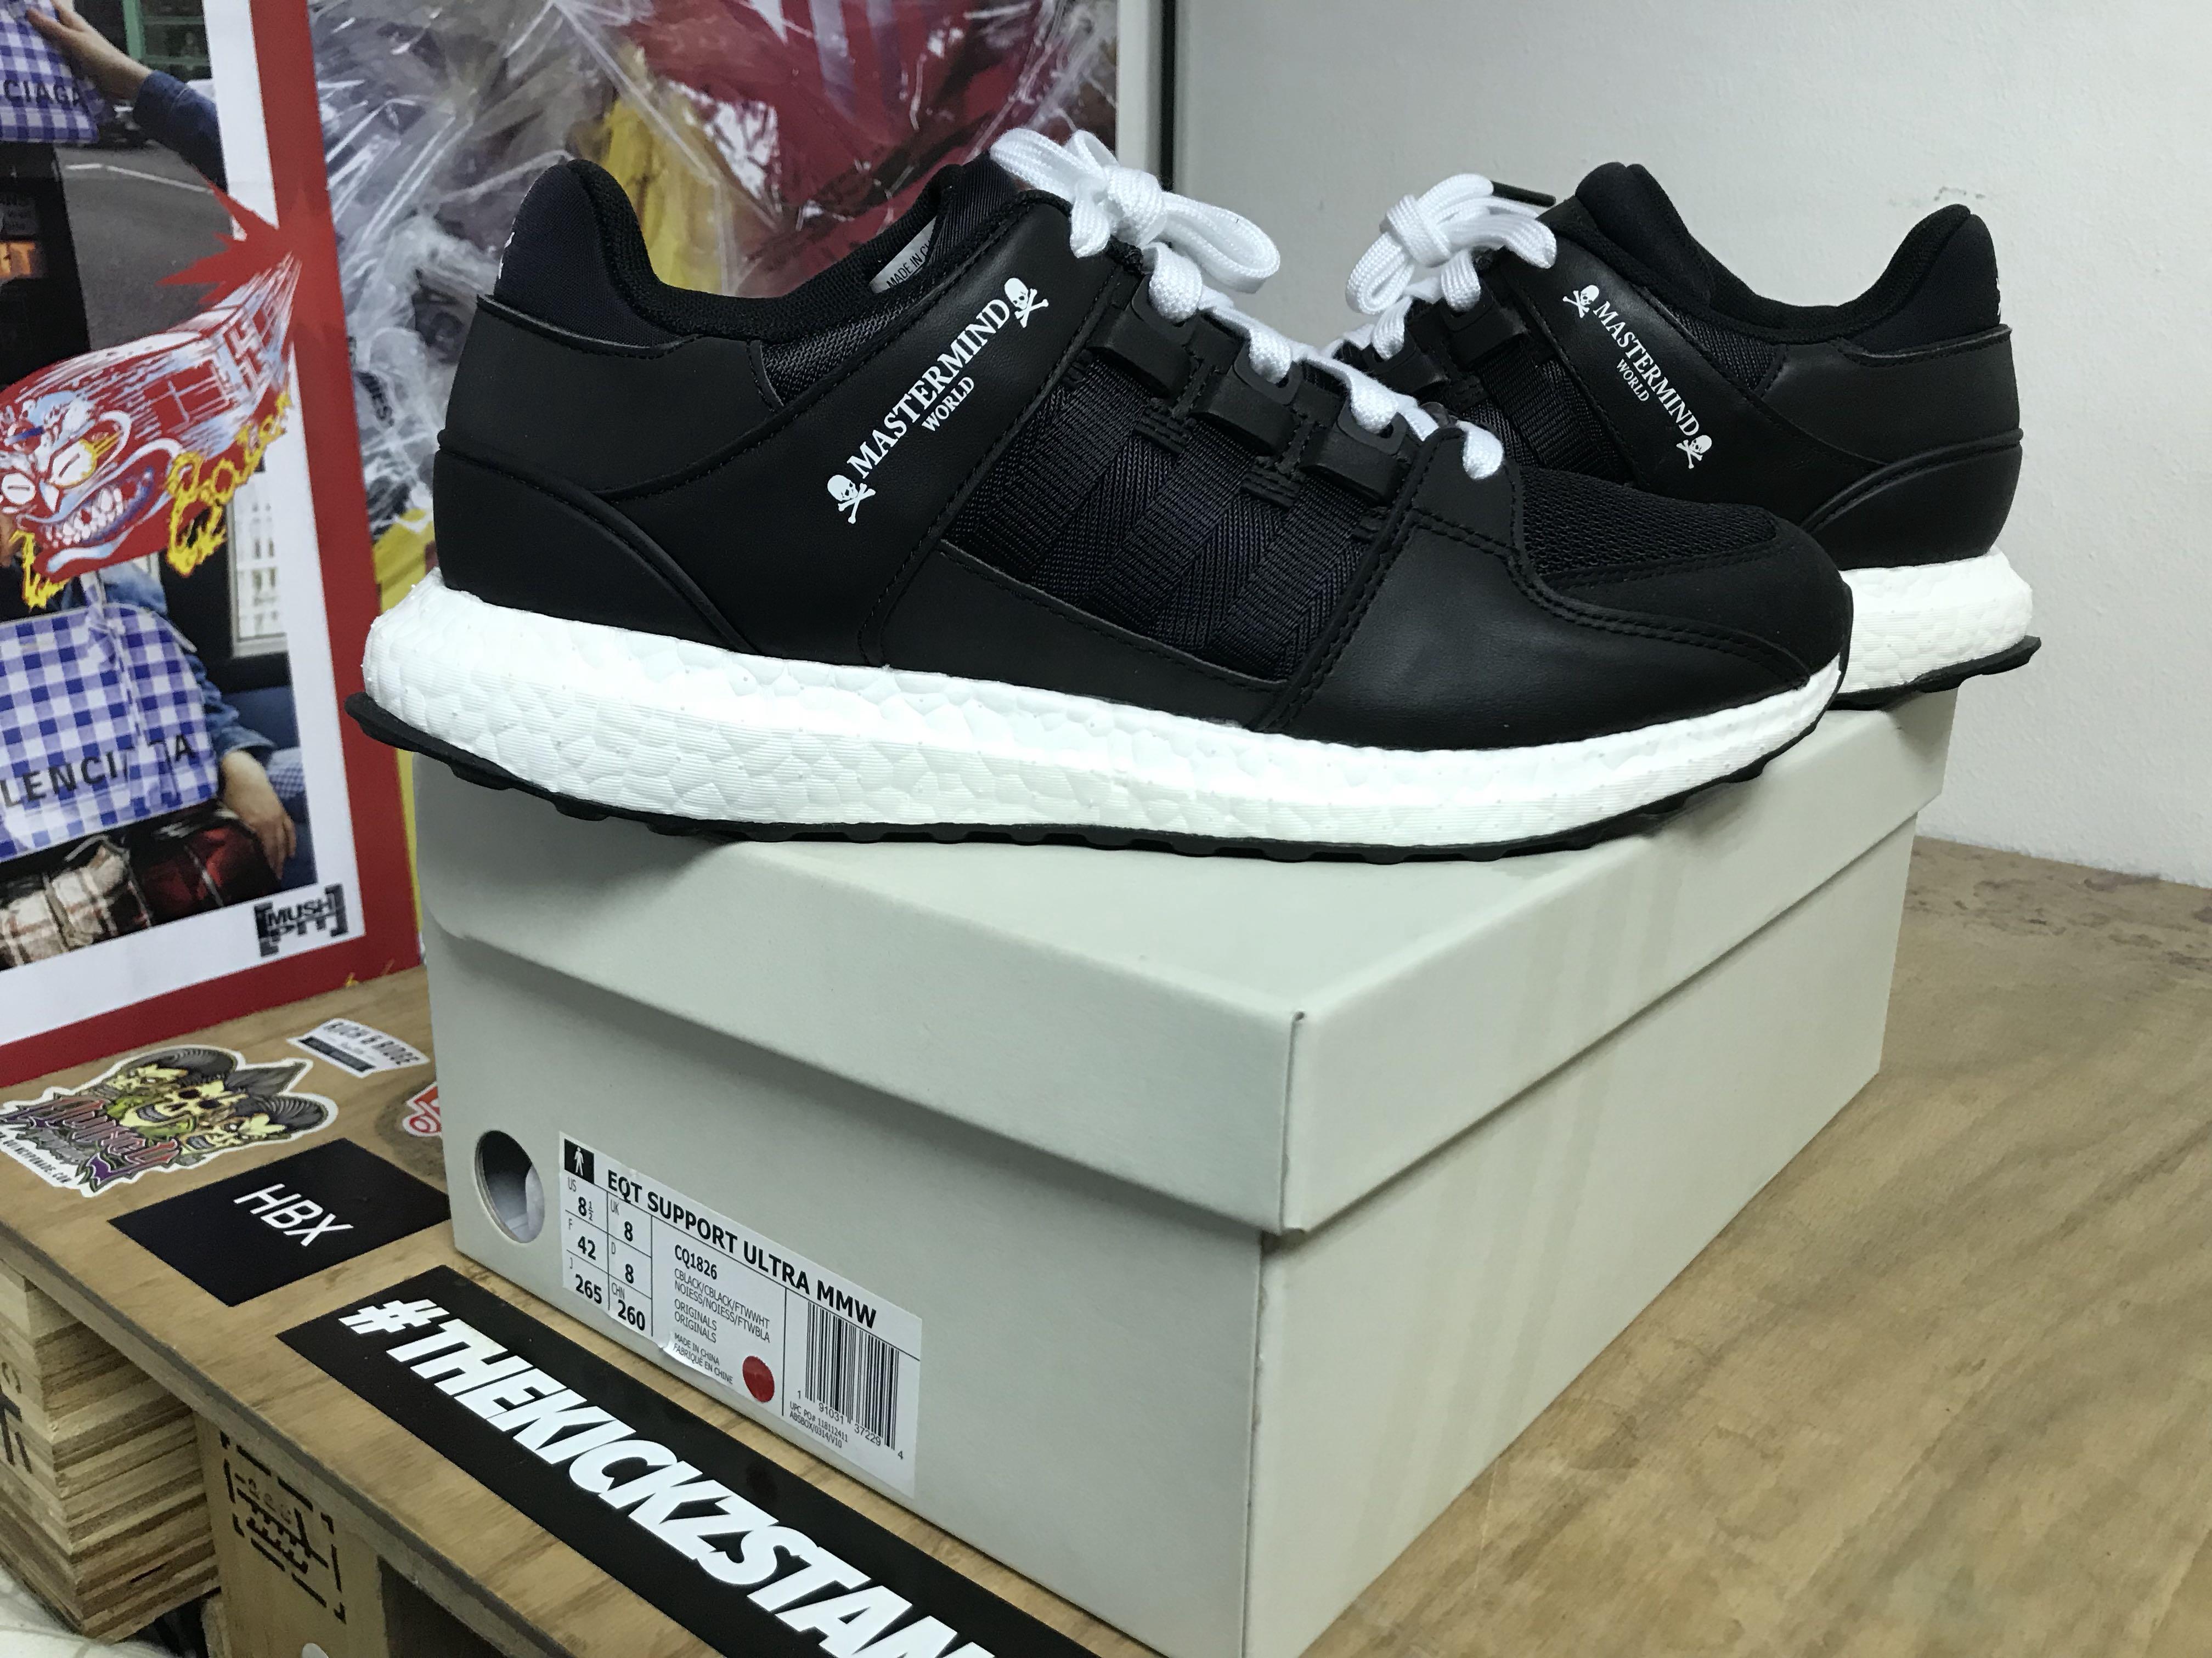 sale retailer d1af1 2194a Adidas x Mastermind eqt ultra